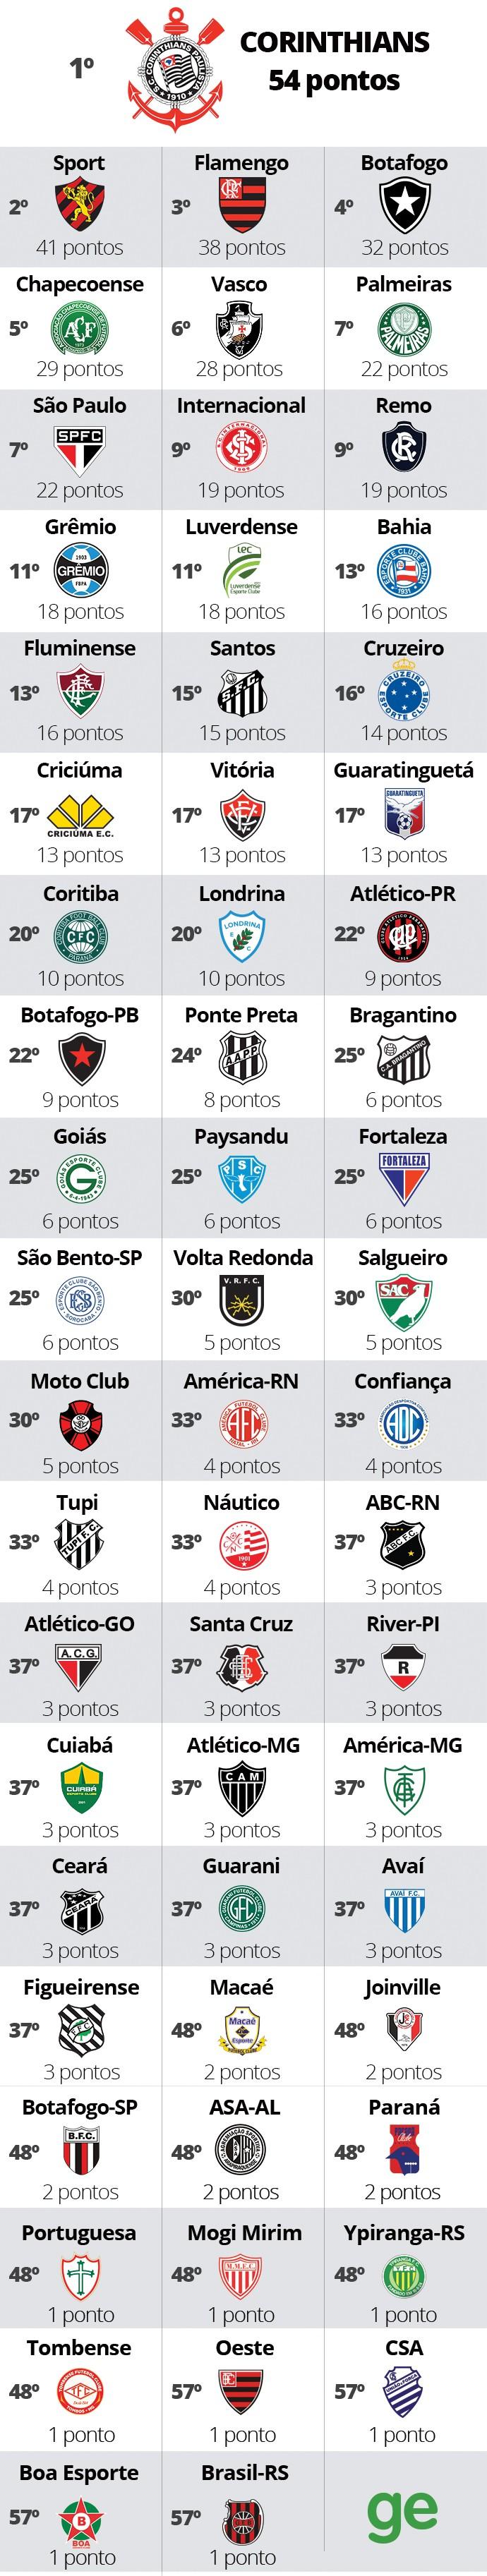 Ranking Clubes v3